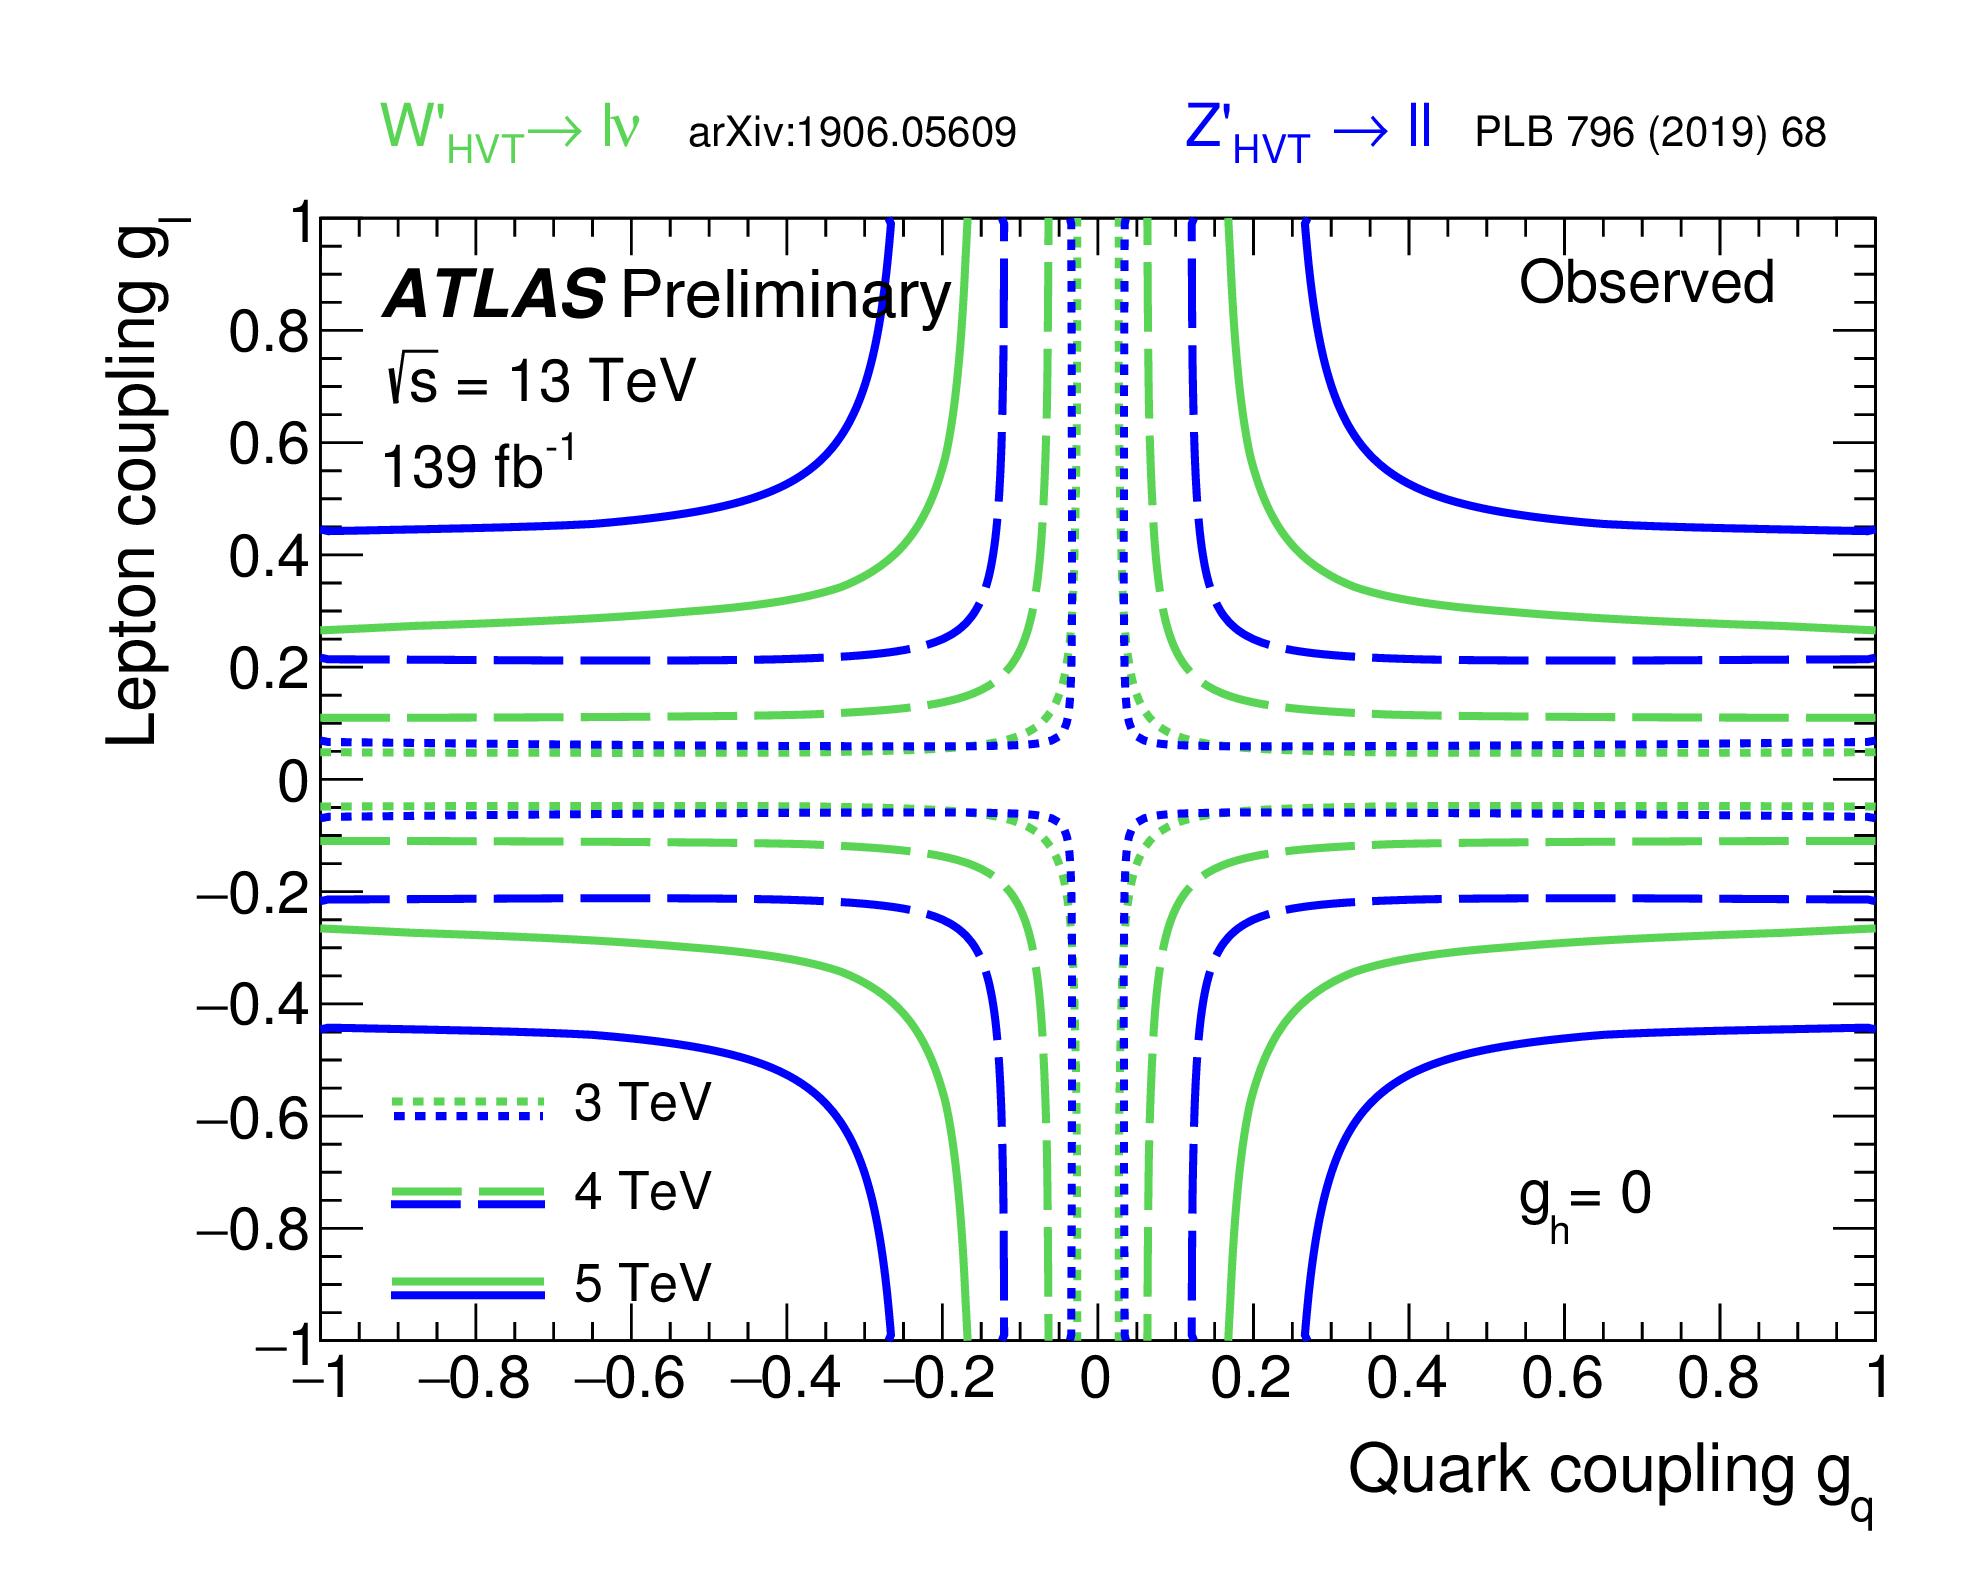 https://atlas.web.cern.ch/Atlas/GROUPS/PHYSICS/CombinedSummaryPlots/EXOTICS/ATLAS_HVT_Lepton_Summary_gl_gq_obs/ATLAS_HVT_Lepton_Summary_gl_gq_obs.png